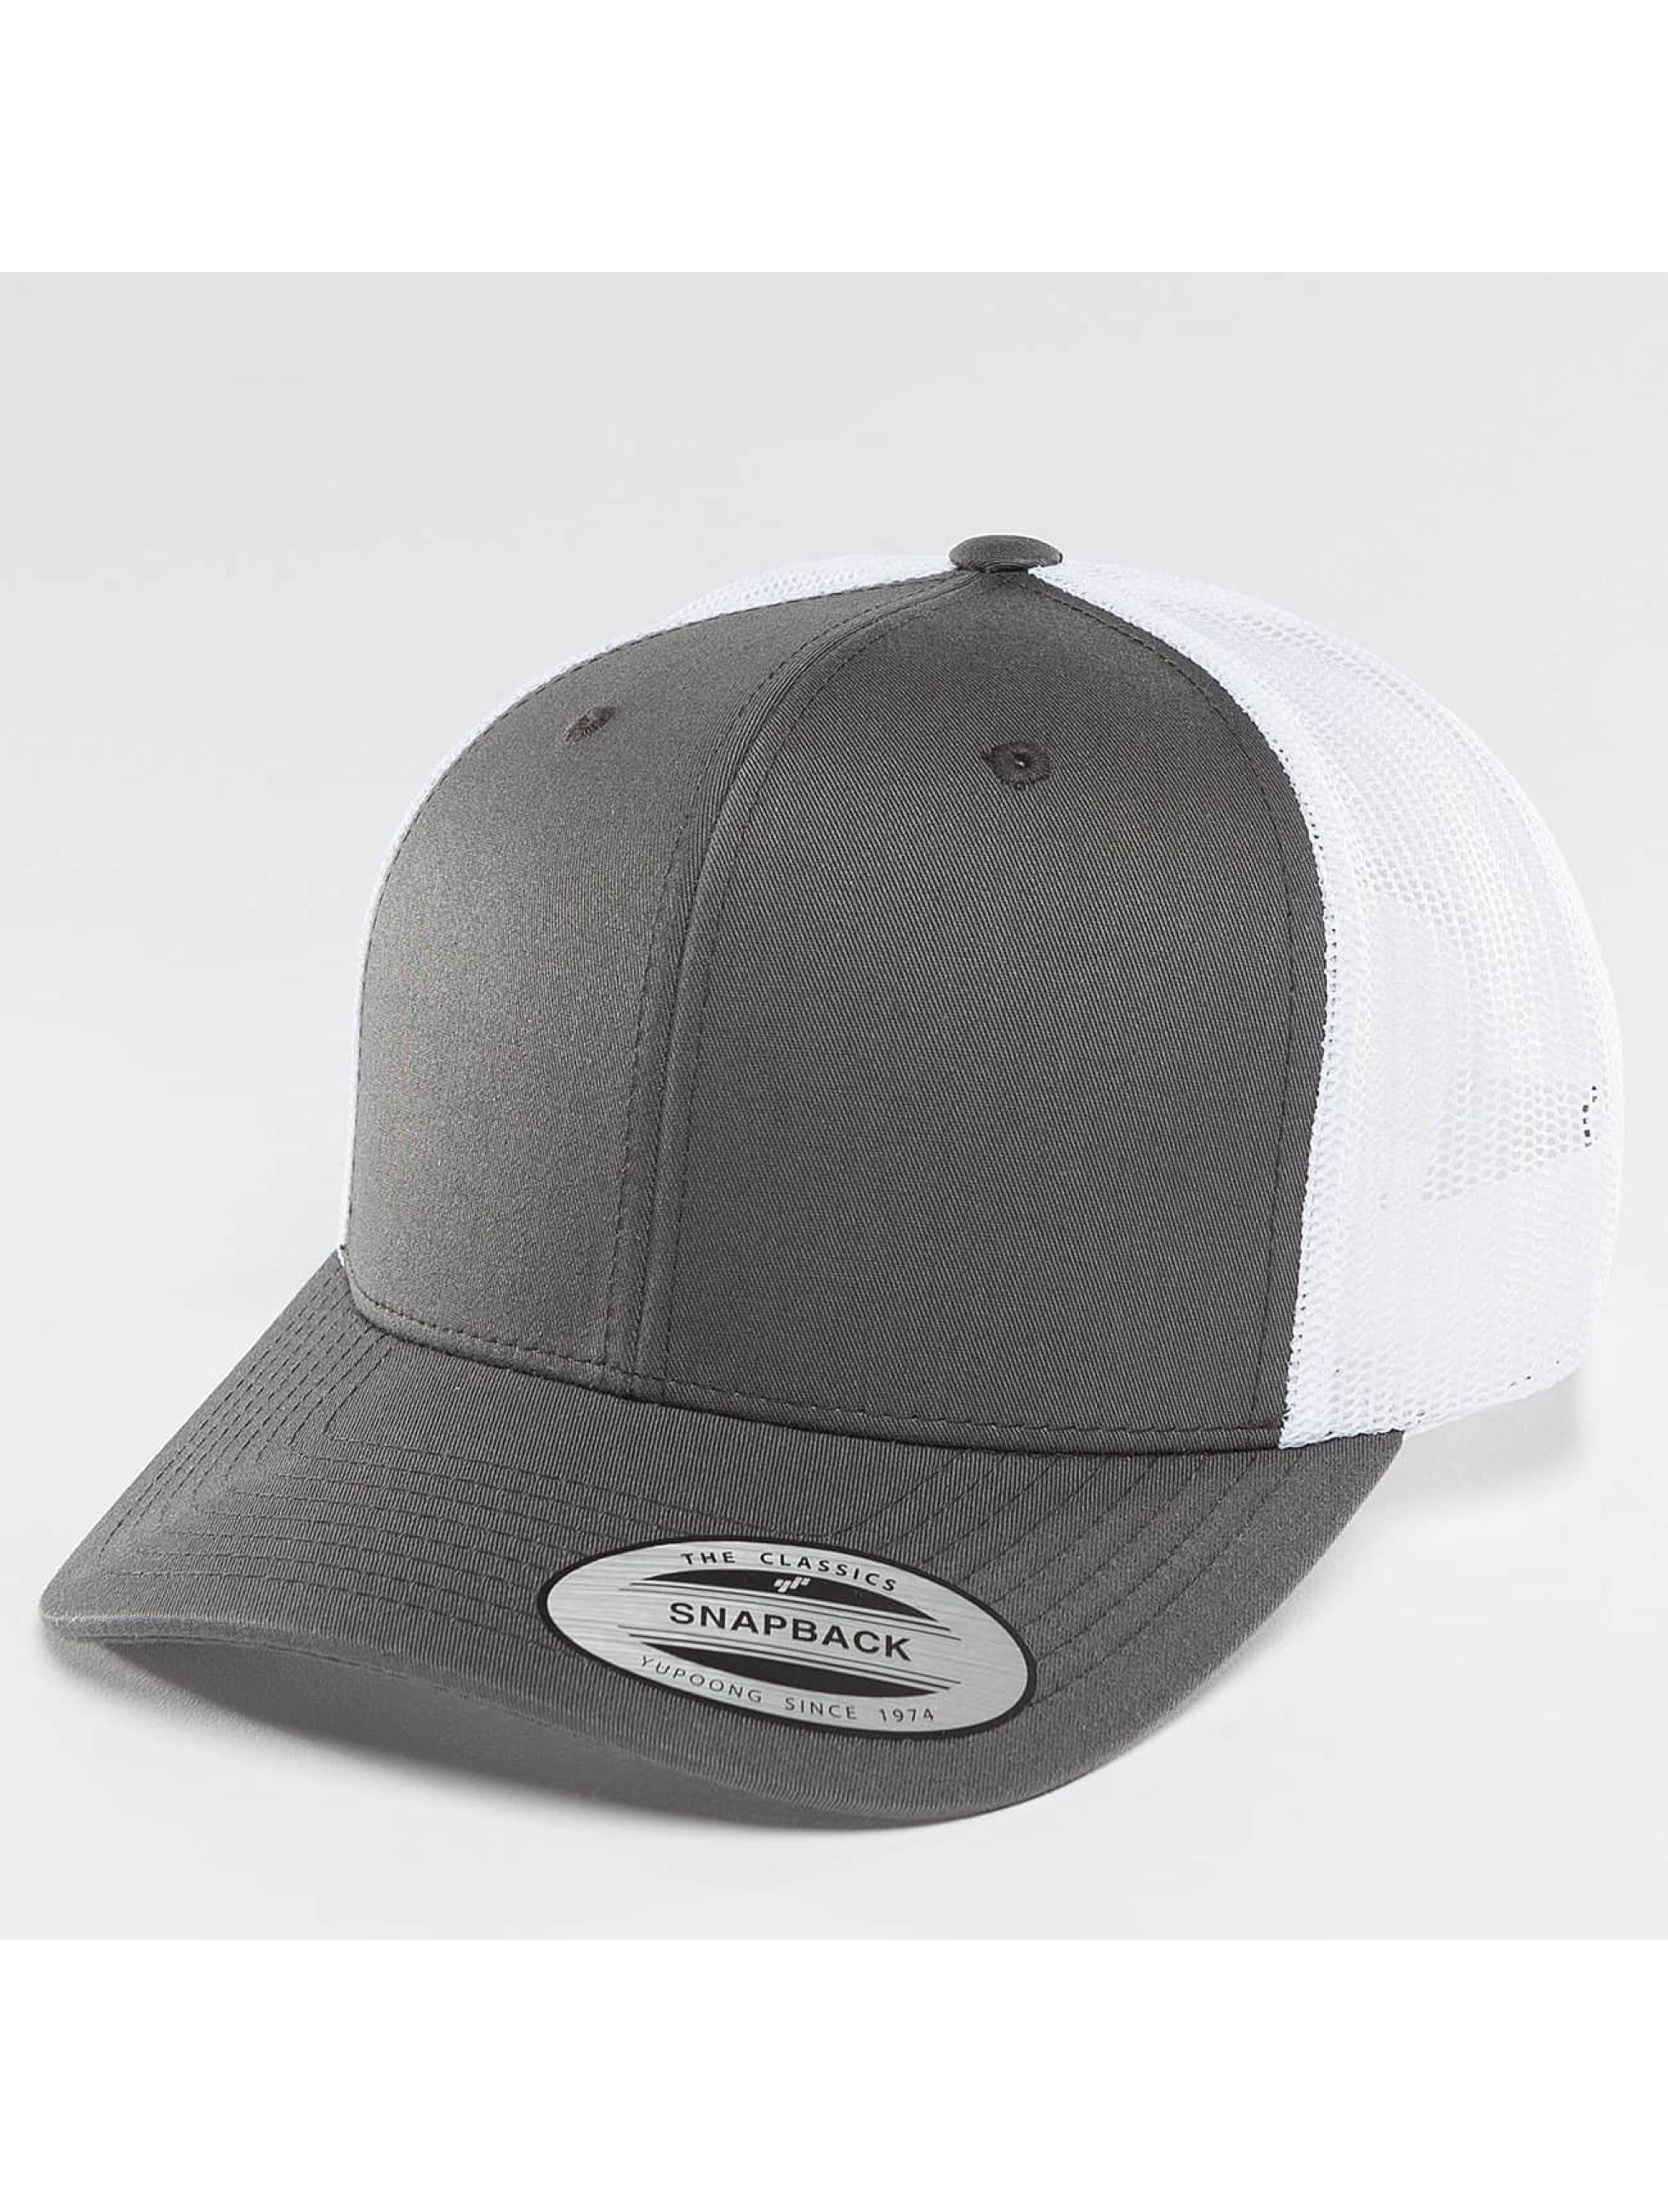 Flexfit / Trucker Cap Retro in grey